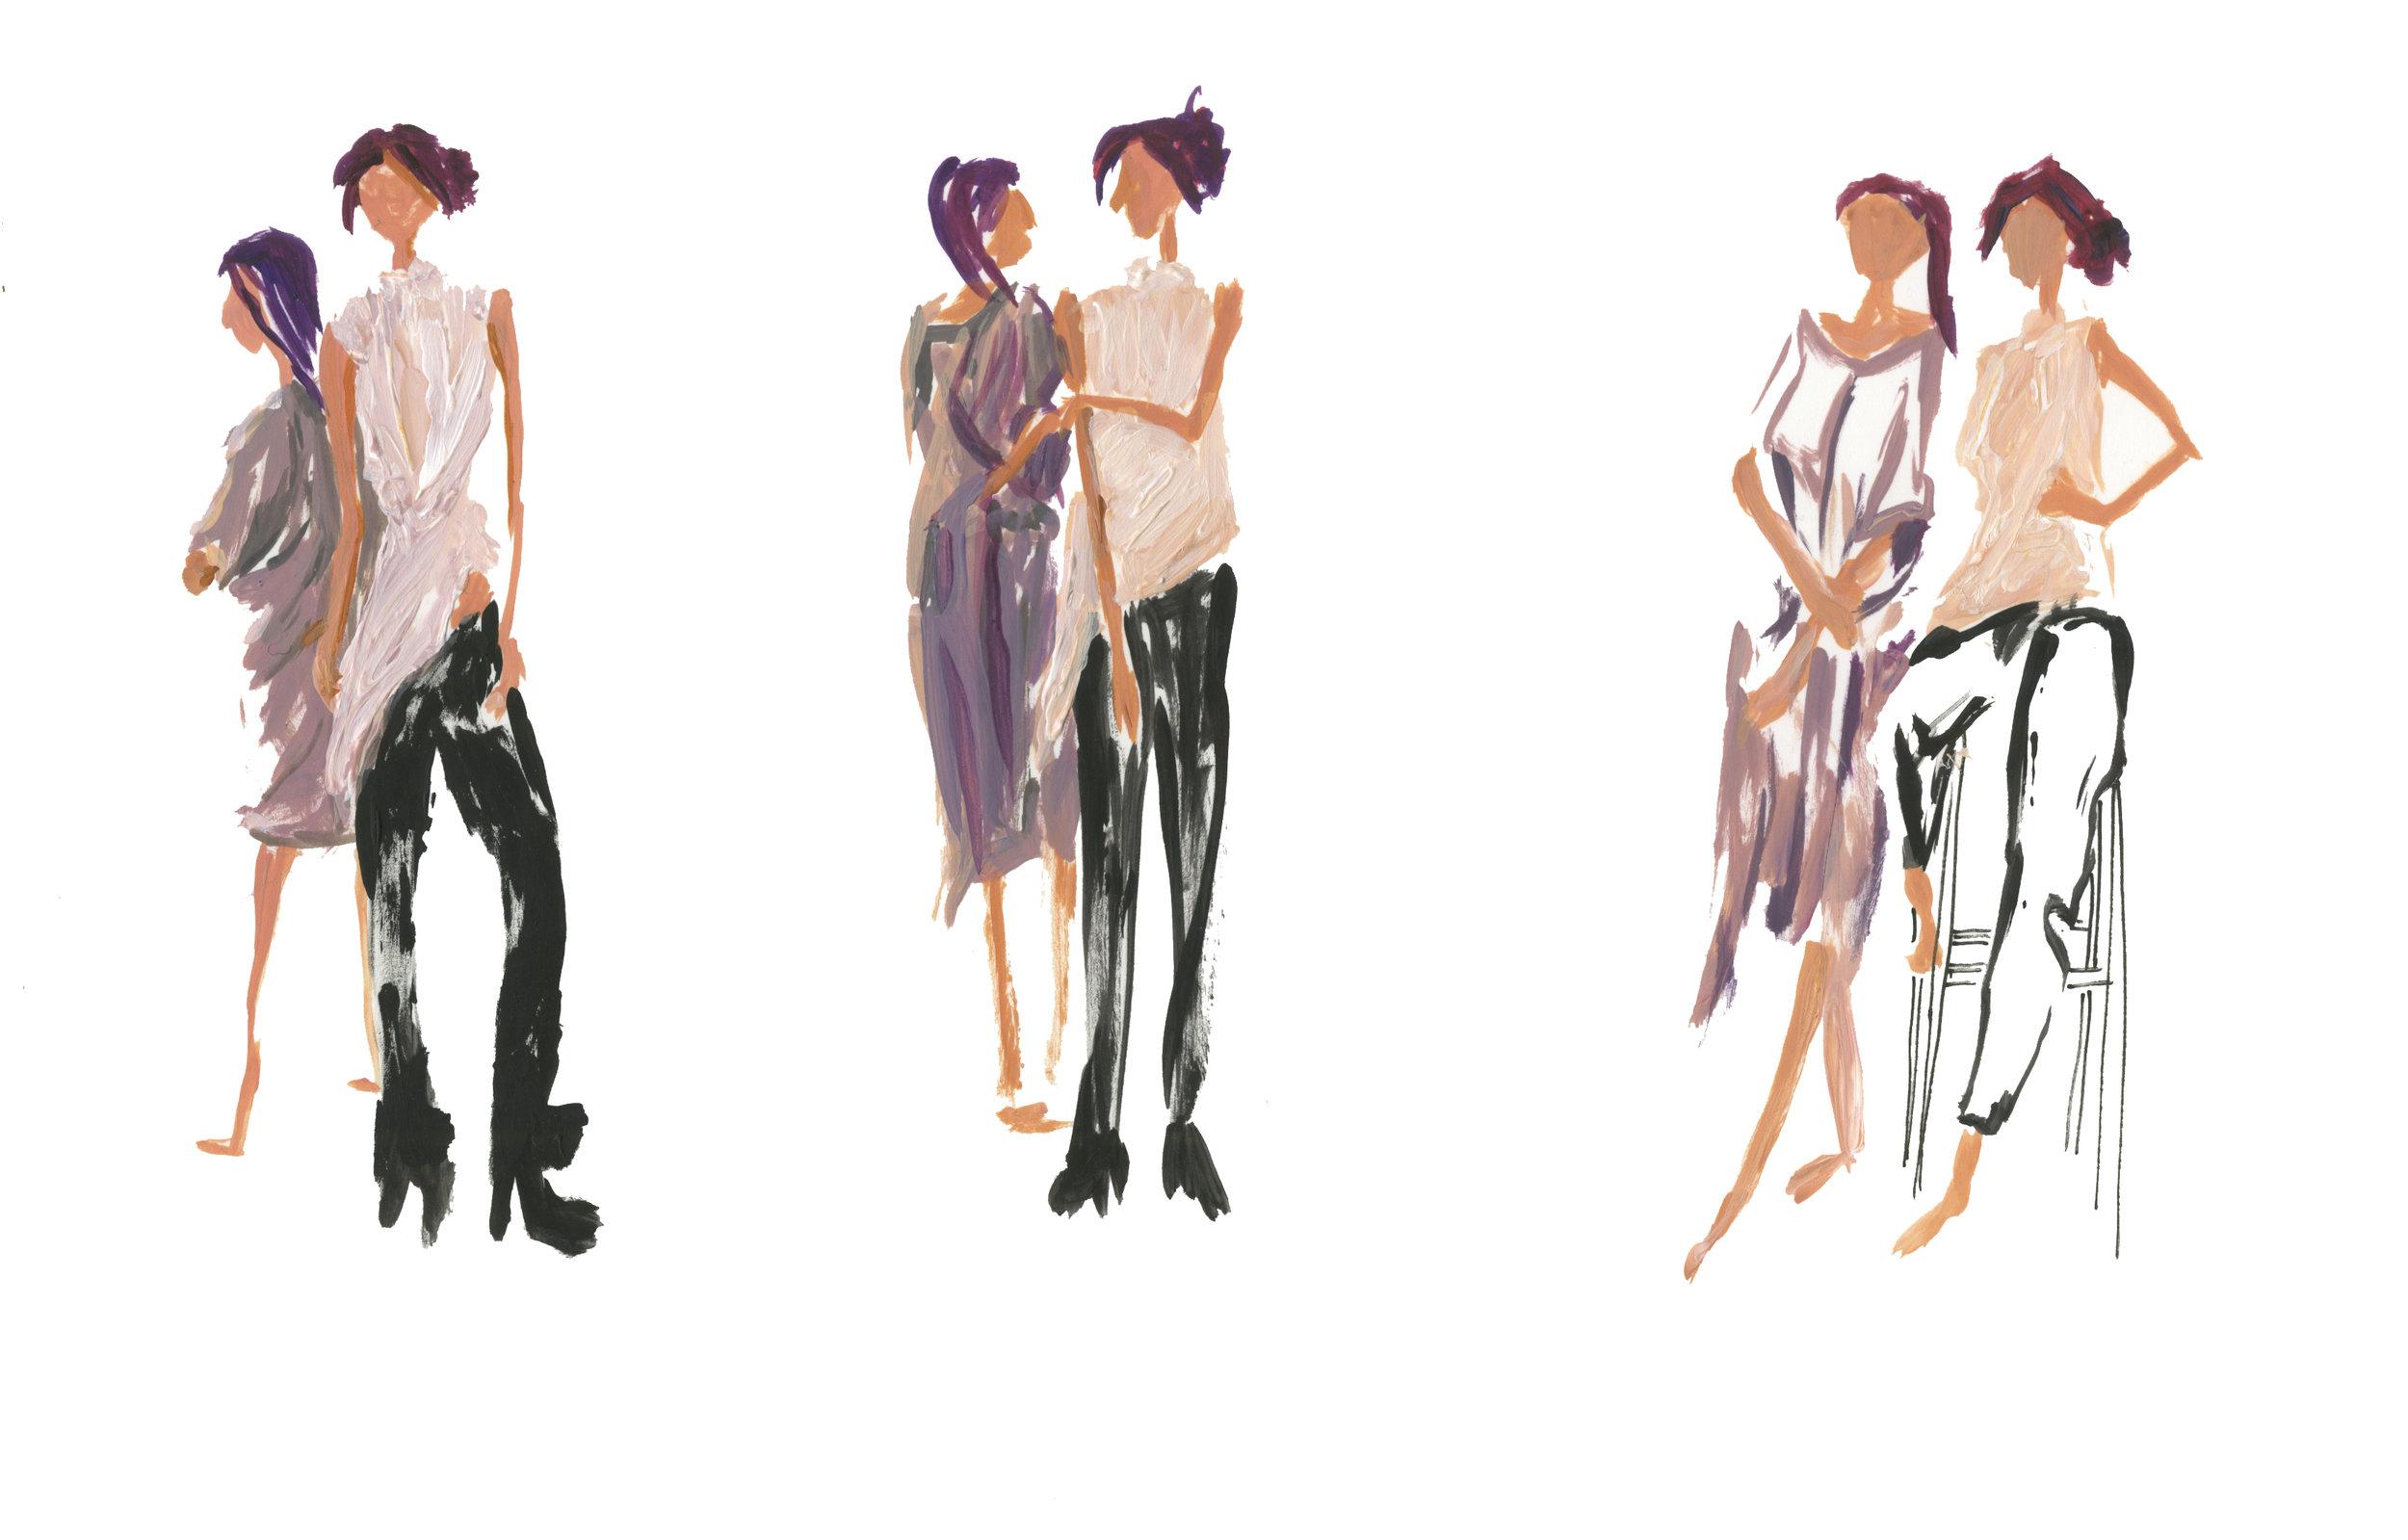 Anderson_FashionIllustration_Acrylic 1.jpg